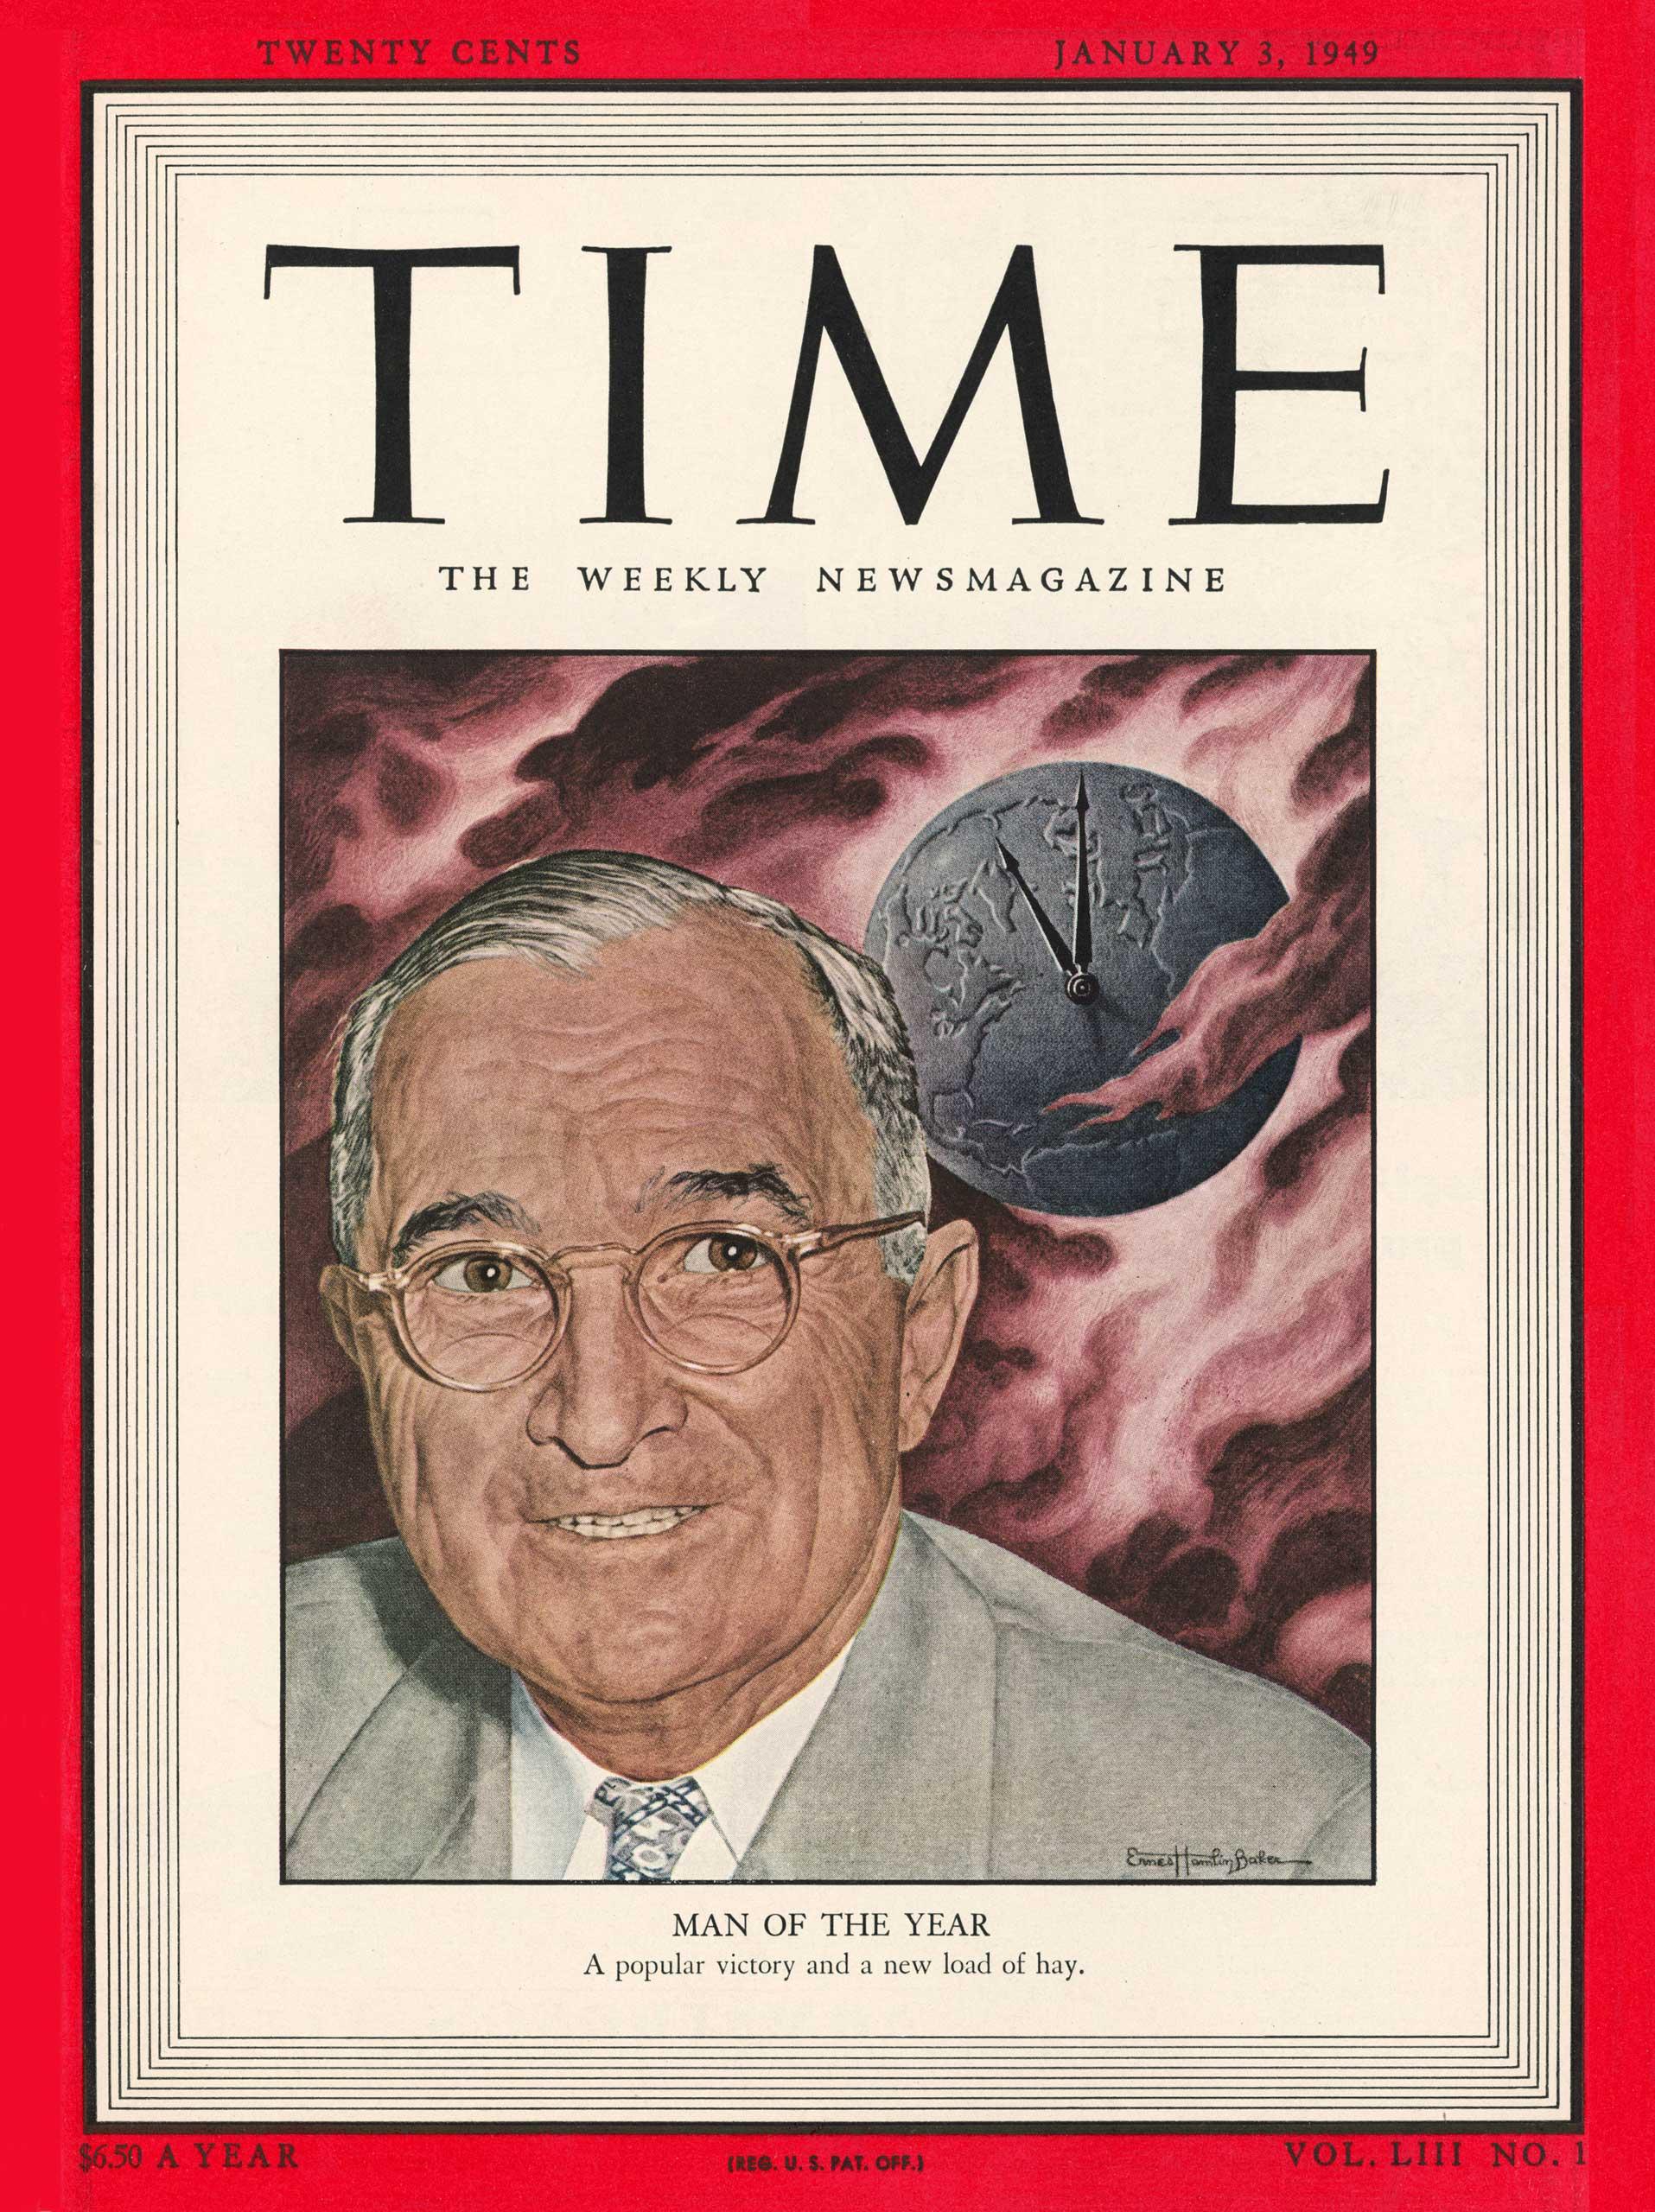 1948: President Harry S. Truman